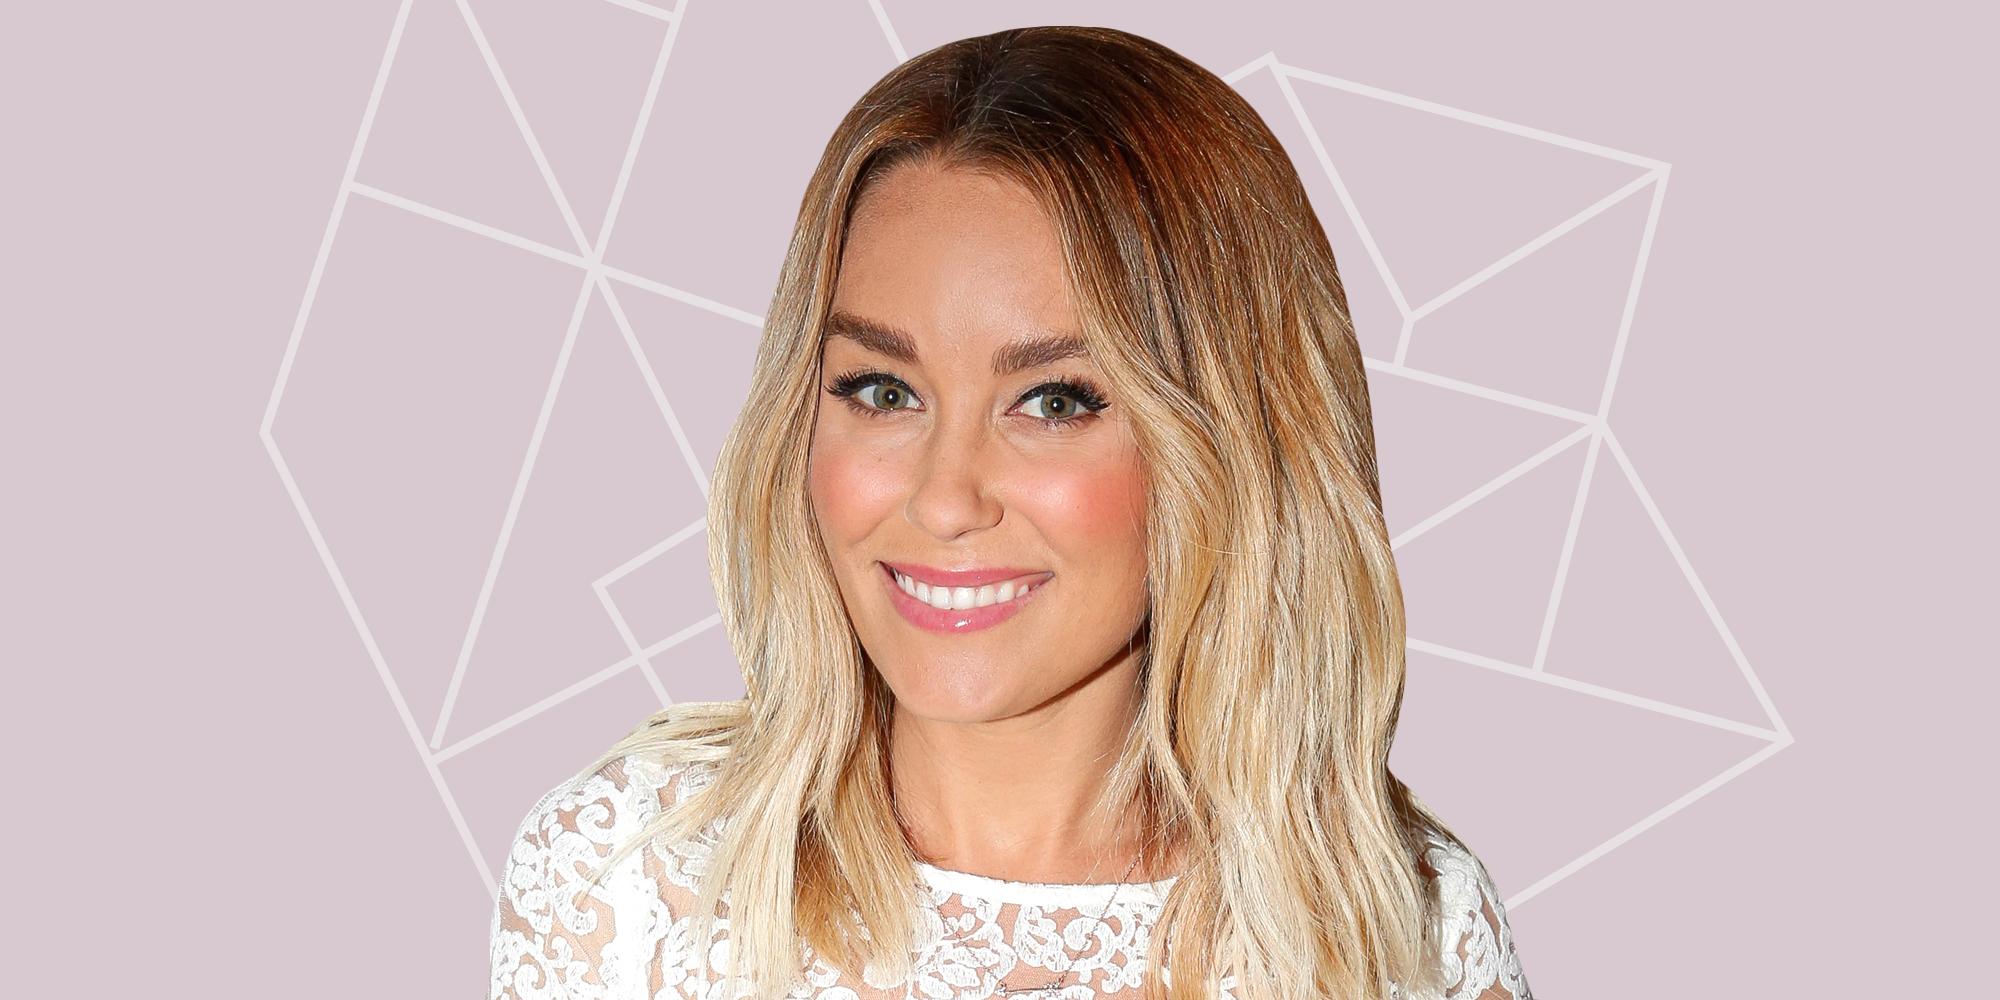 lauren conrad beauty secrets amy nadine makeup tips